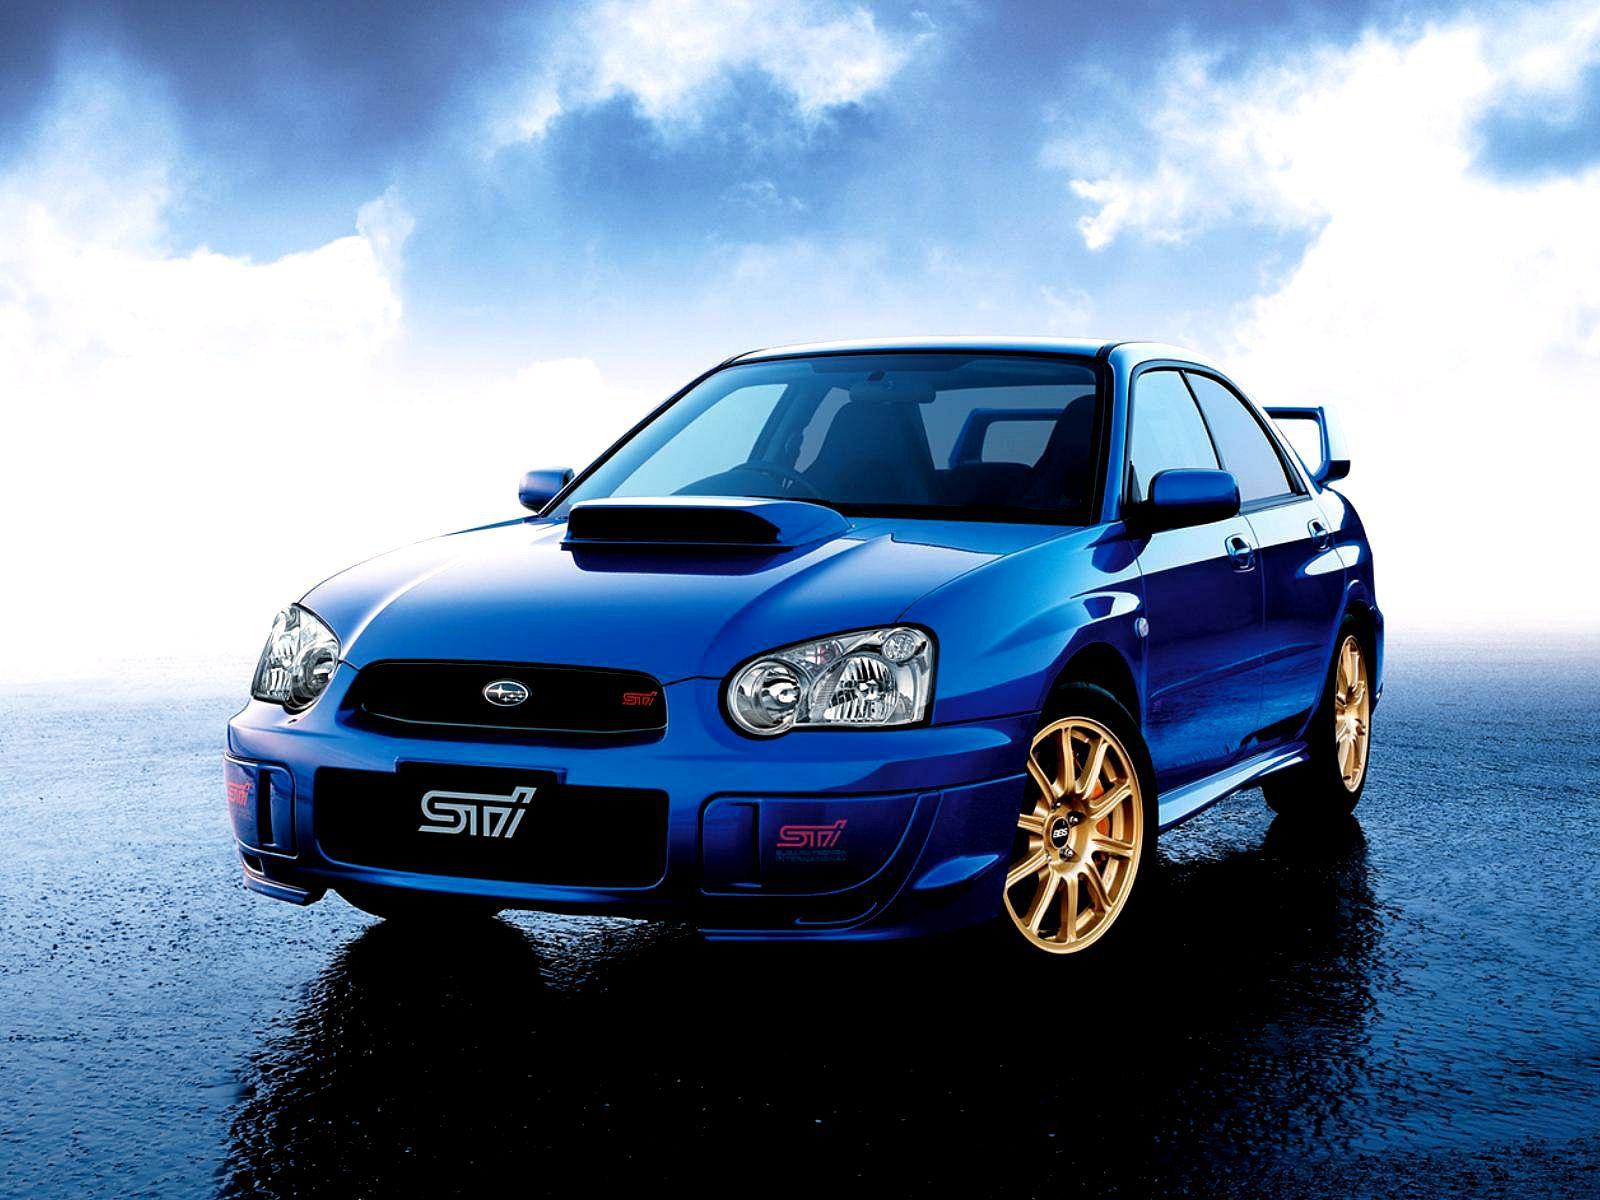 Car Subaru Impreza Wrx Sti On The Road Wallpapers And